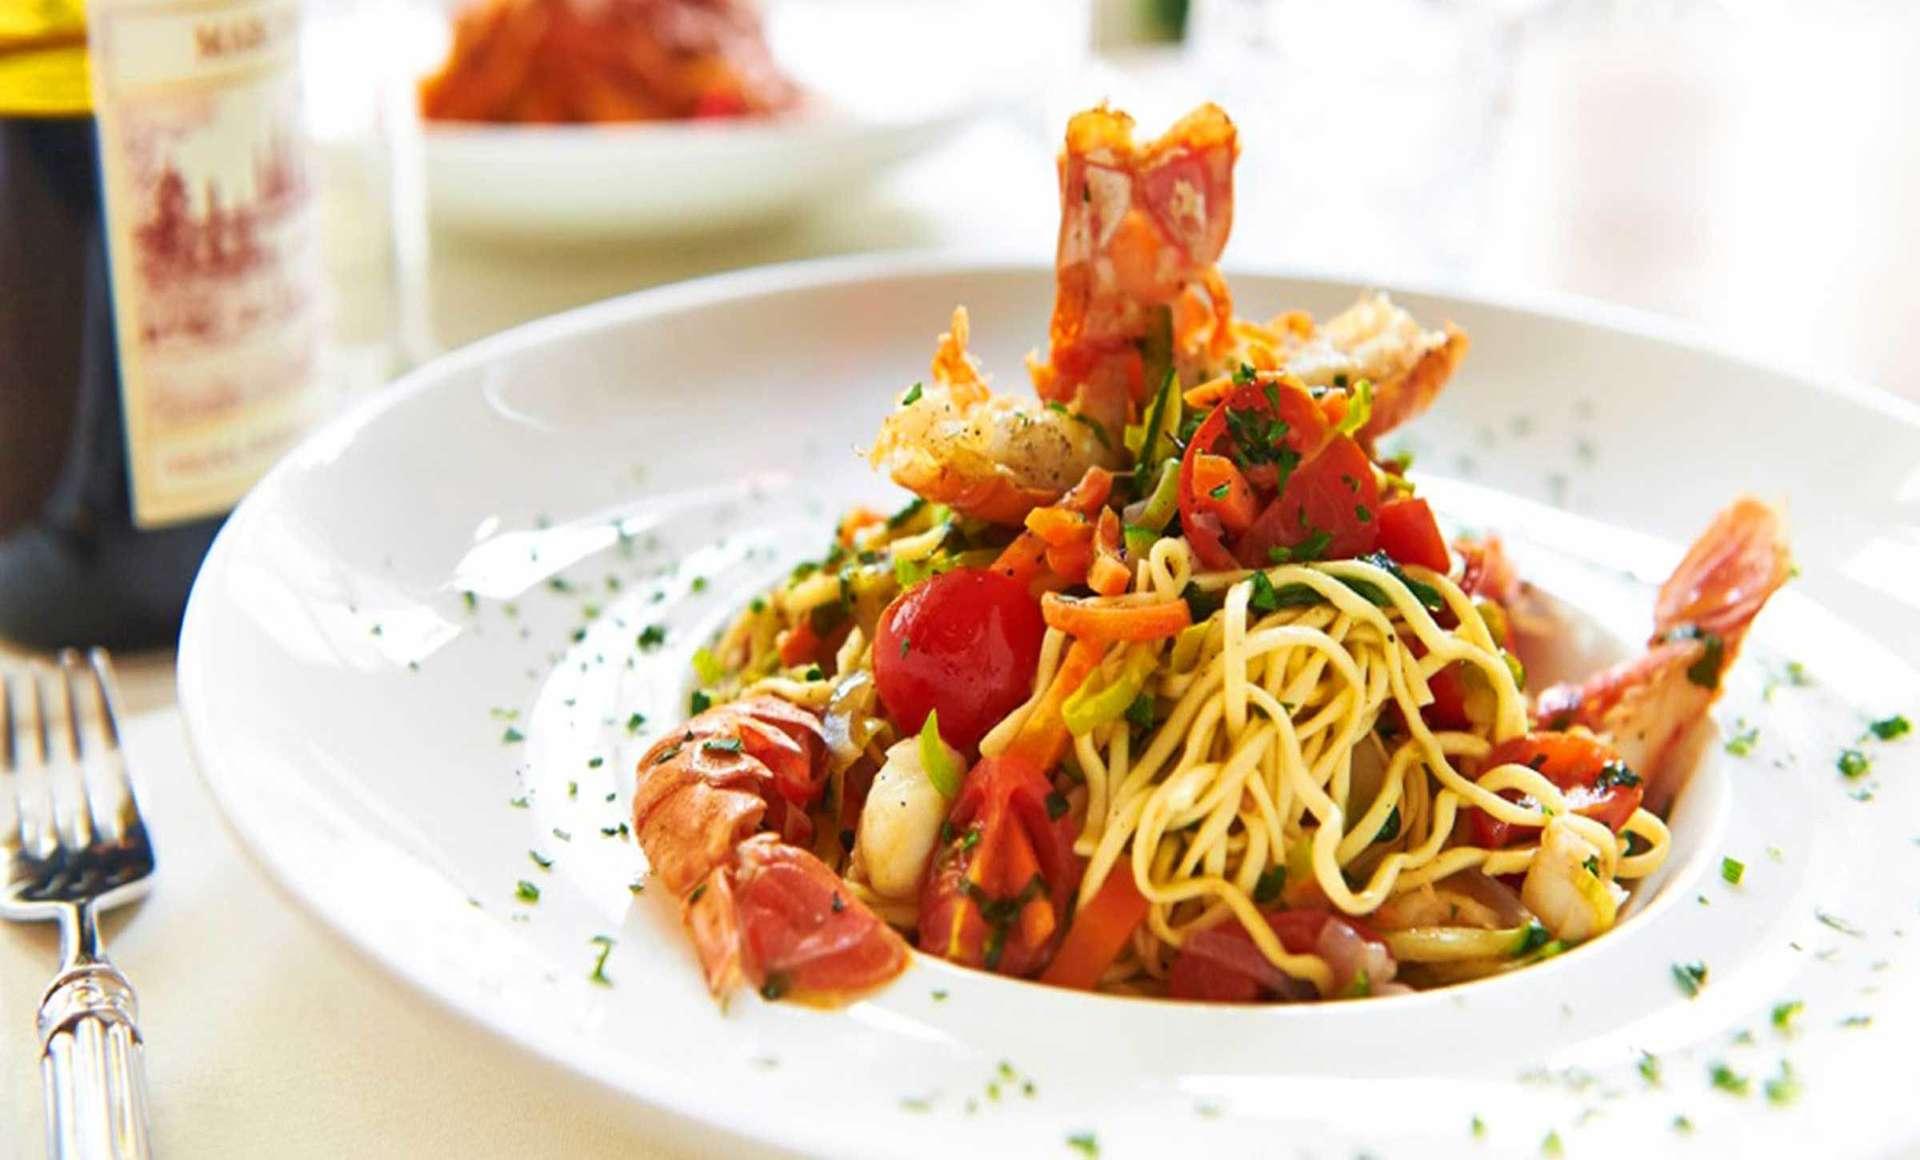 csm_Hotel_Roessli_Zuerich_Schweiz_Restaurant_Il_Gattopardo_Spaghetti_pomodori_209b7003b8